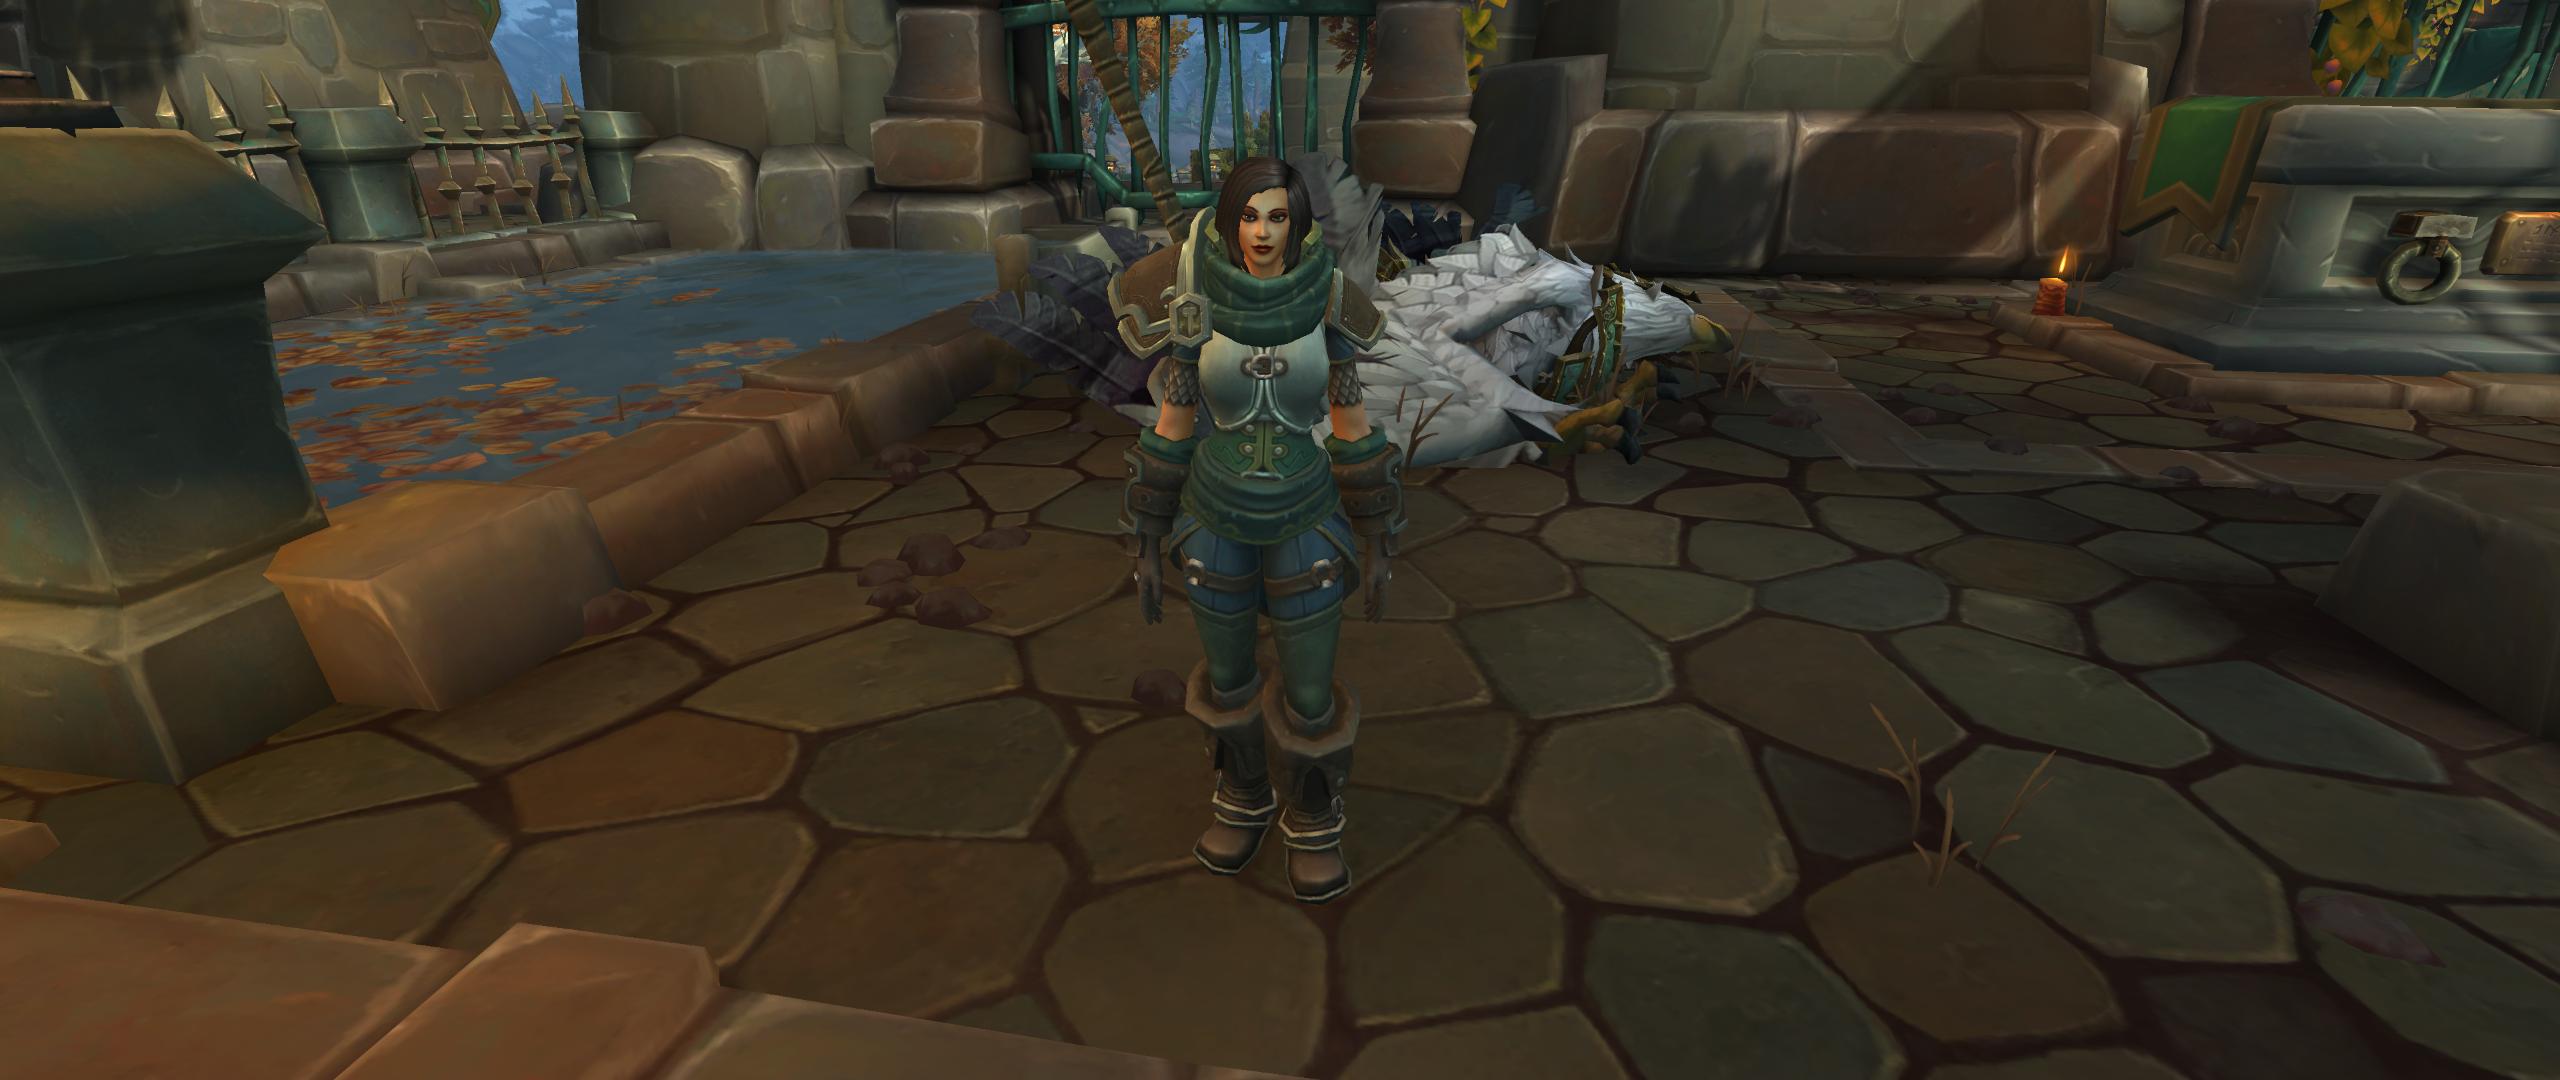 World Of Warcraft Screenshot 2019.01.24 - 18.53.57.22.png - World of Warcraft